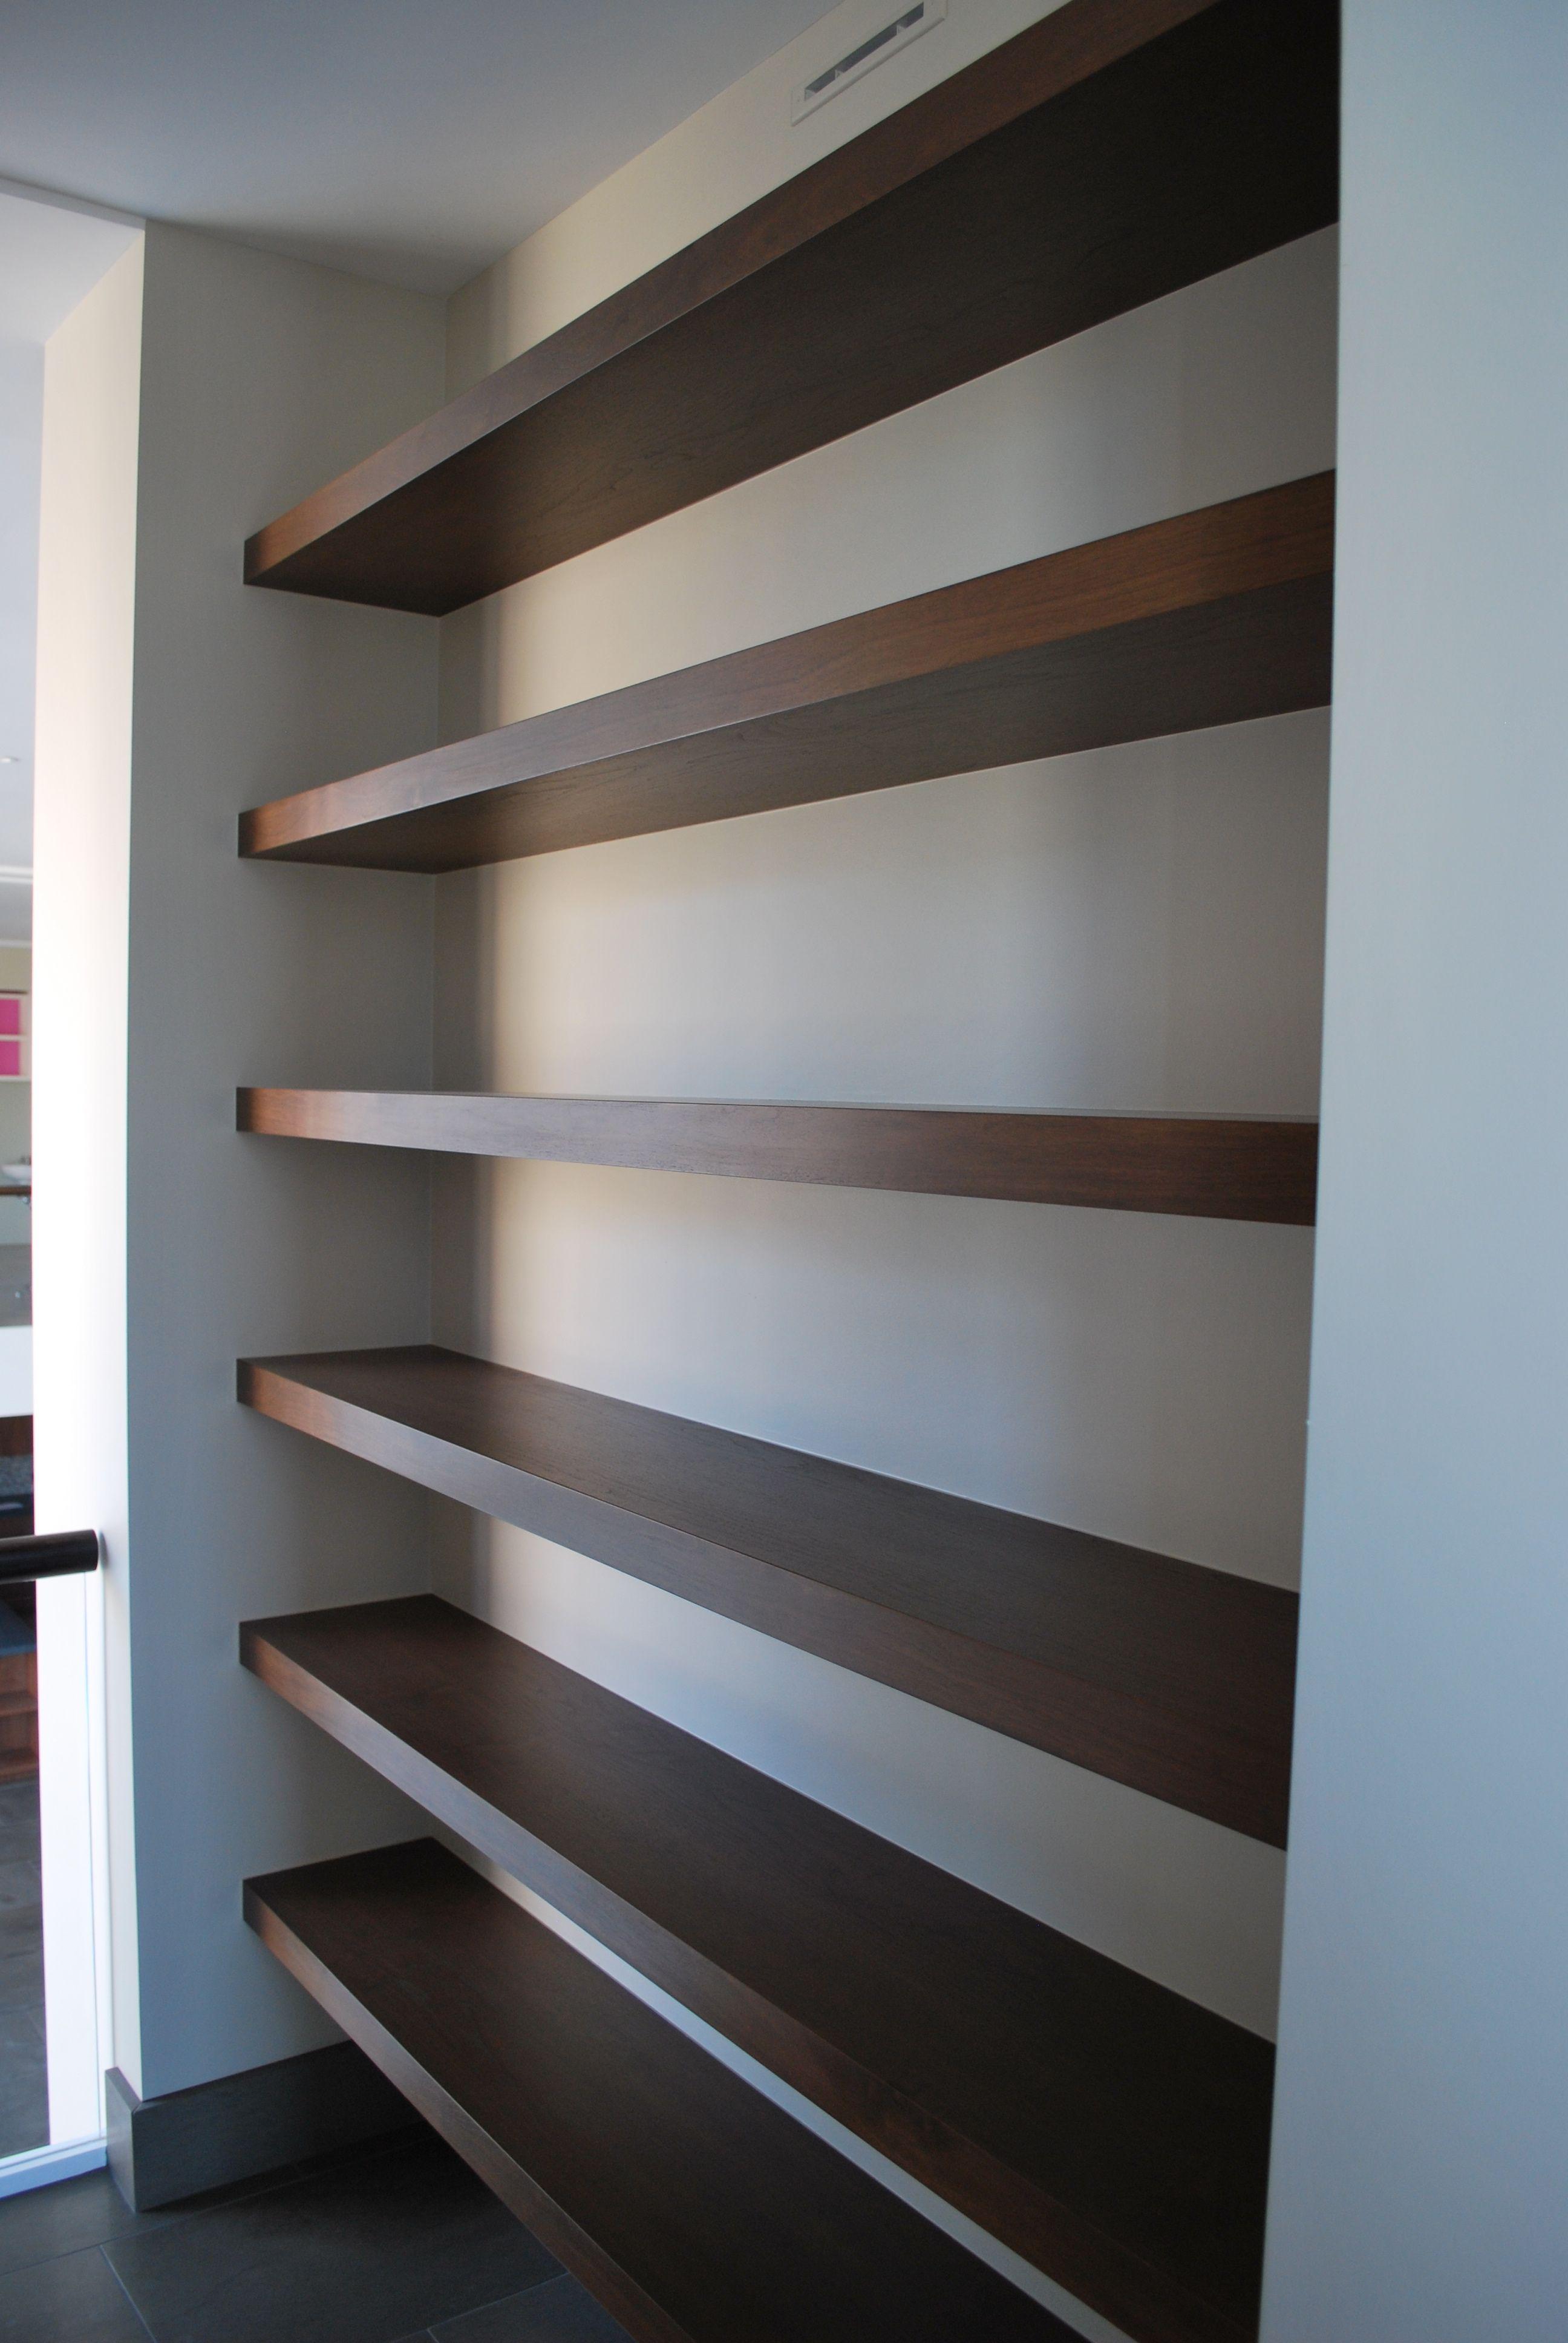 Built-In Walnut Shelving Unit. Basement ... & Built-In Walnut Shelving Unit | Interior Design //\\ Living Room ...